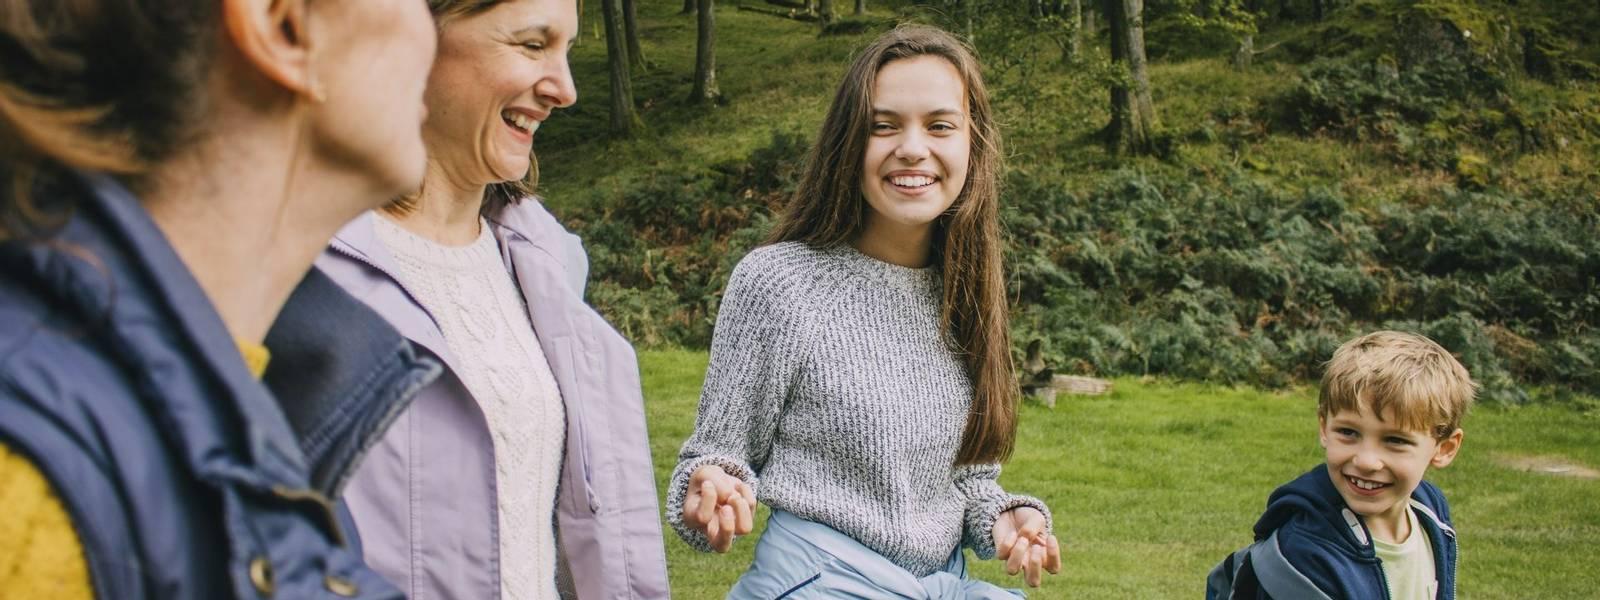 Three Generation Family Hiking